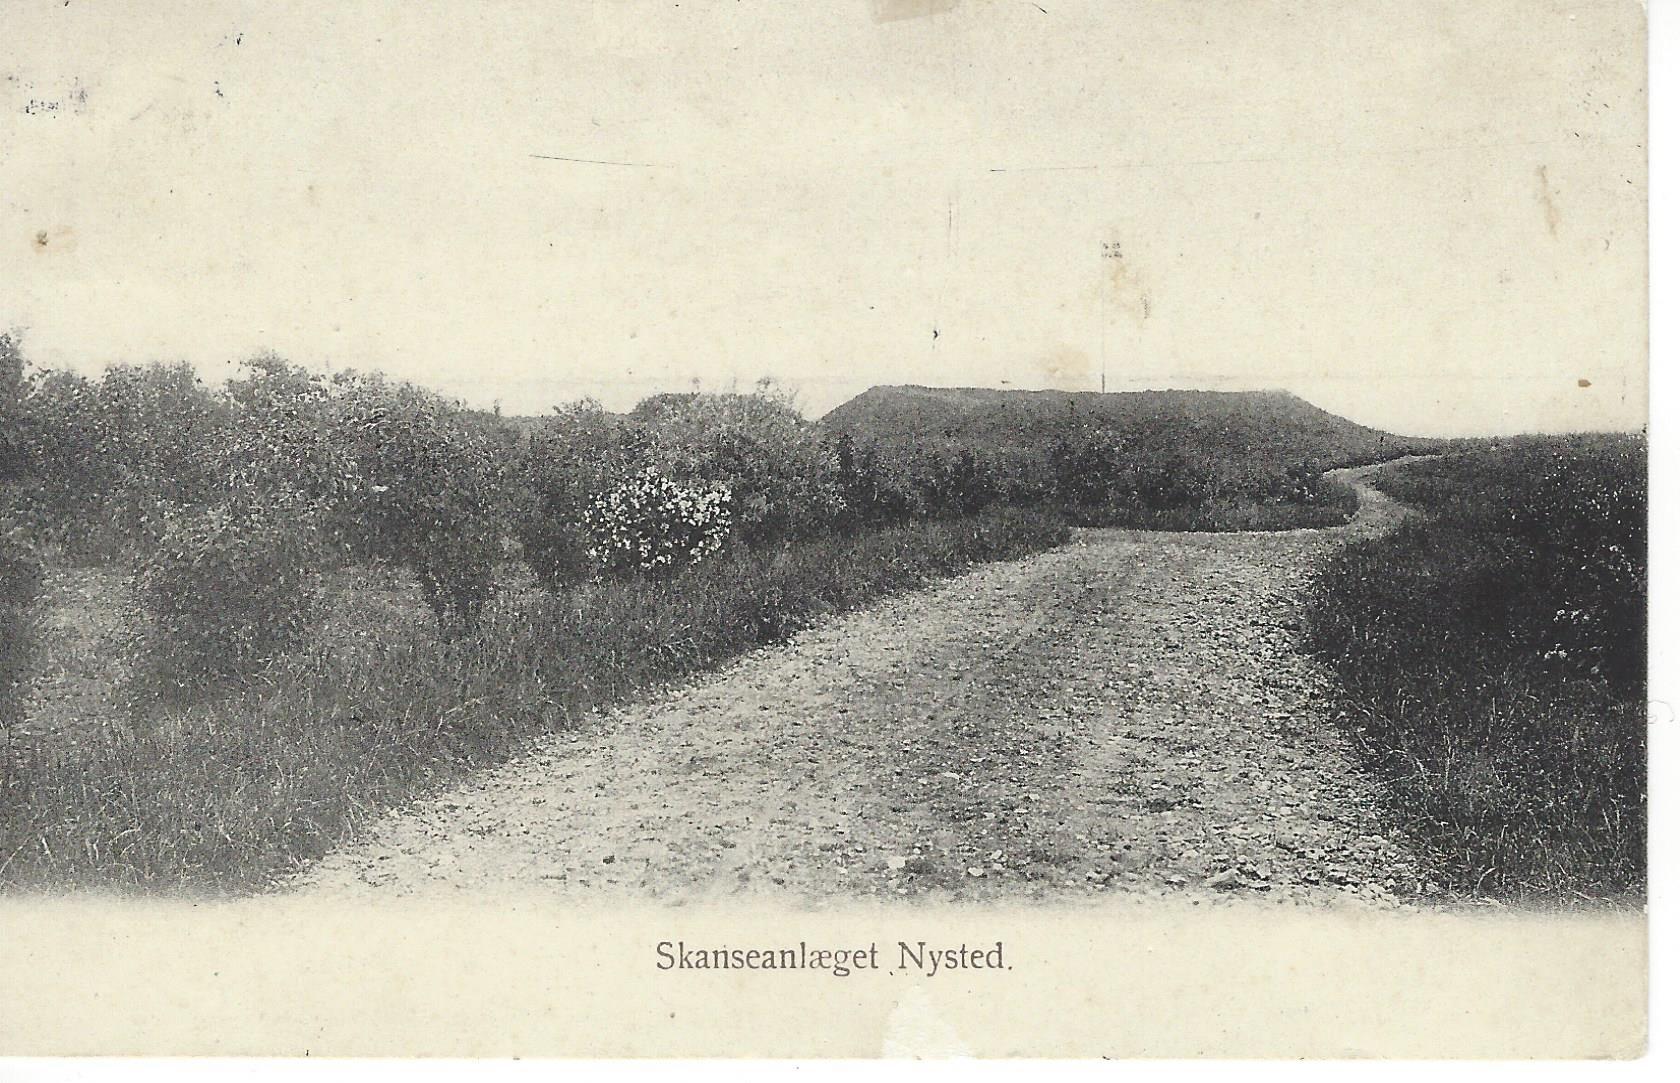 03-Skanseanlægget-1915